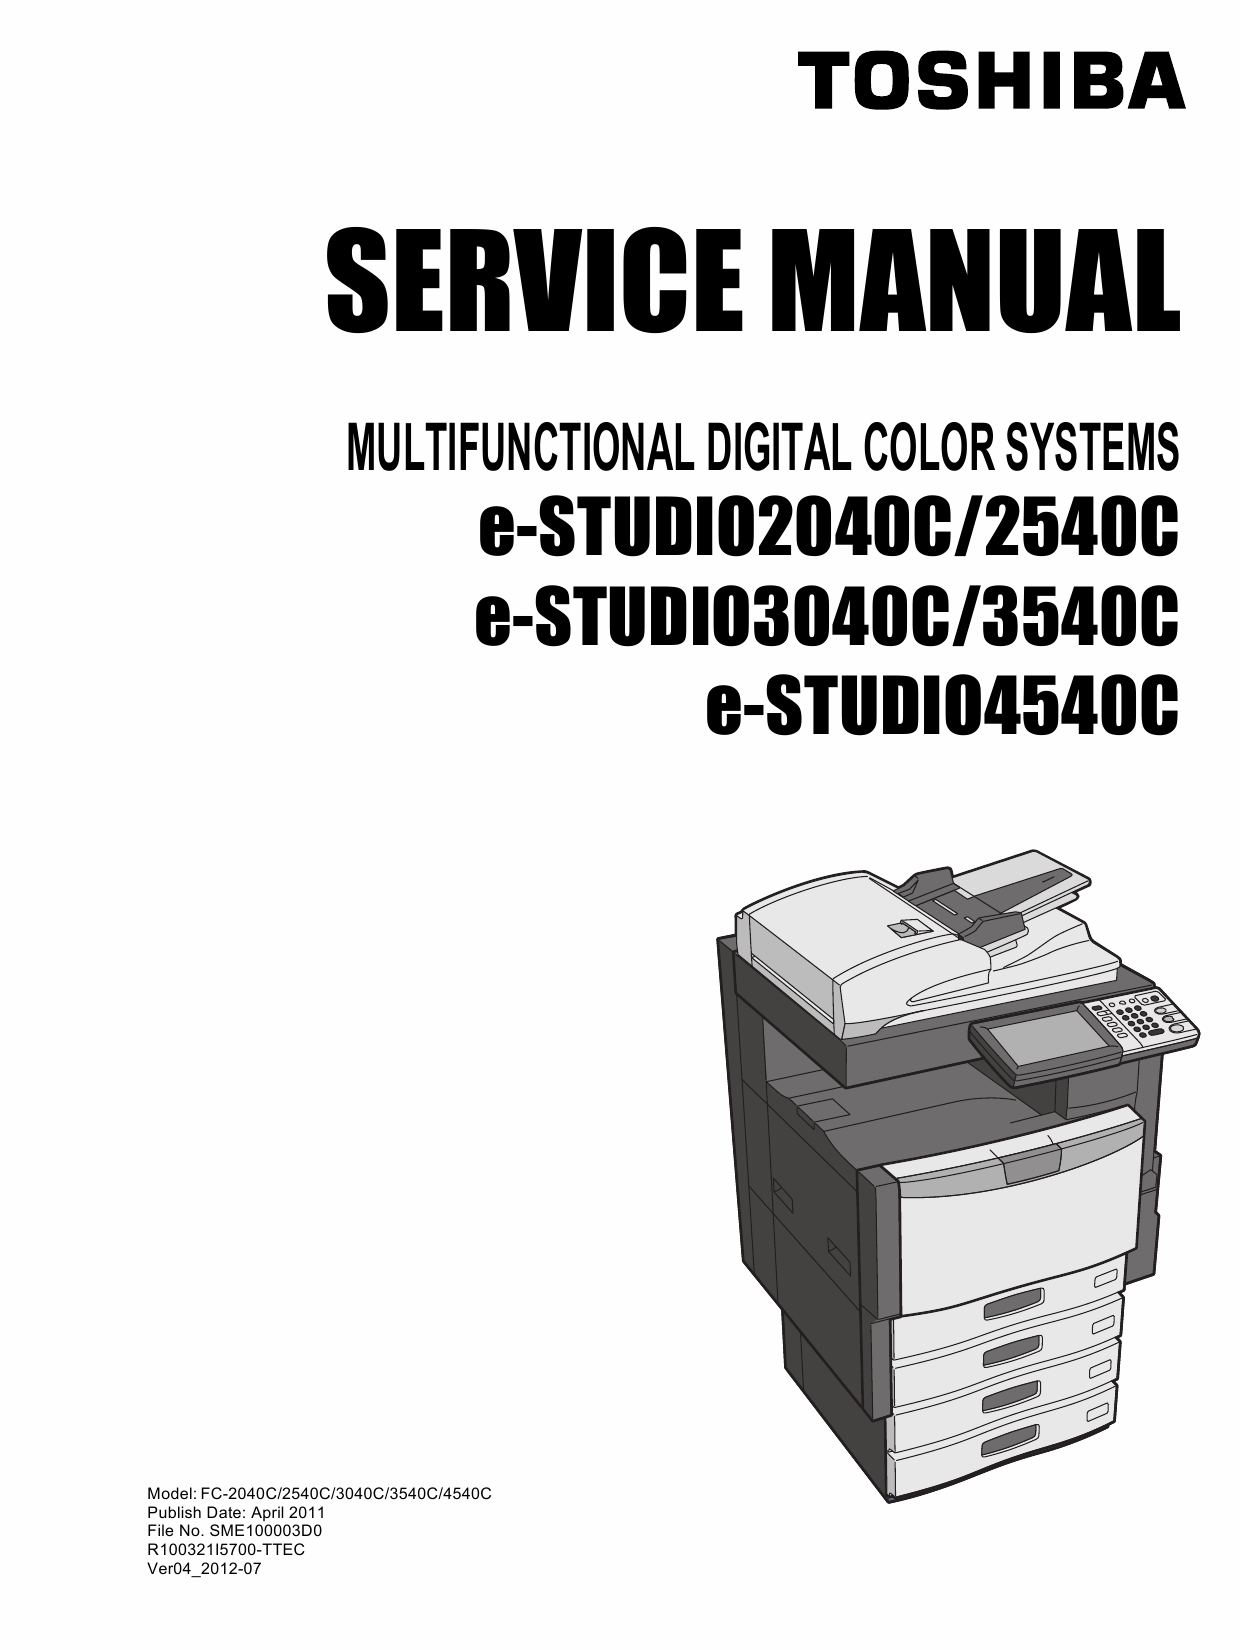 toshiba e studio 4540c manual how to and user guide instructions u2022 rh lakopacific com